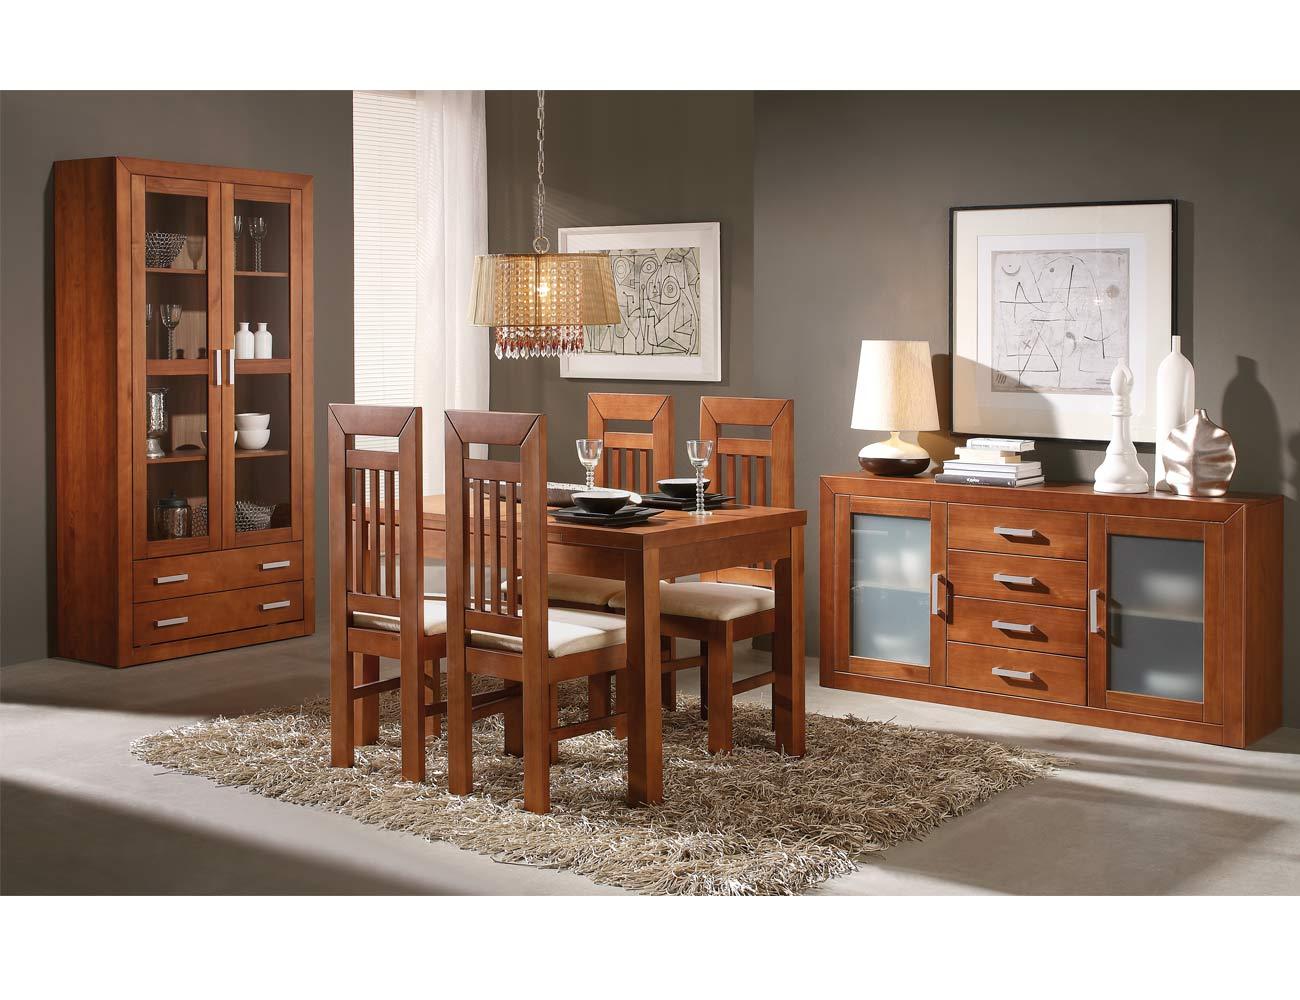 Best Mueble Vitrina Comedor Contemporary - Casa & Diseño Ideas ...